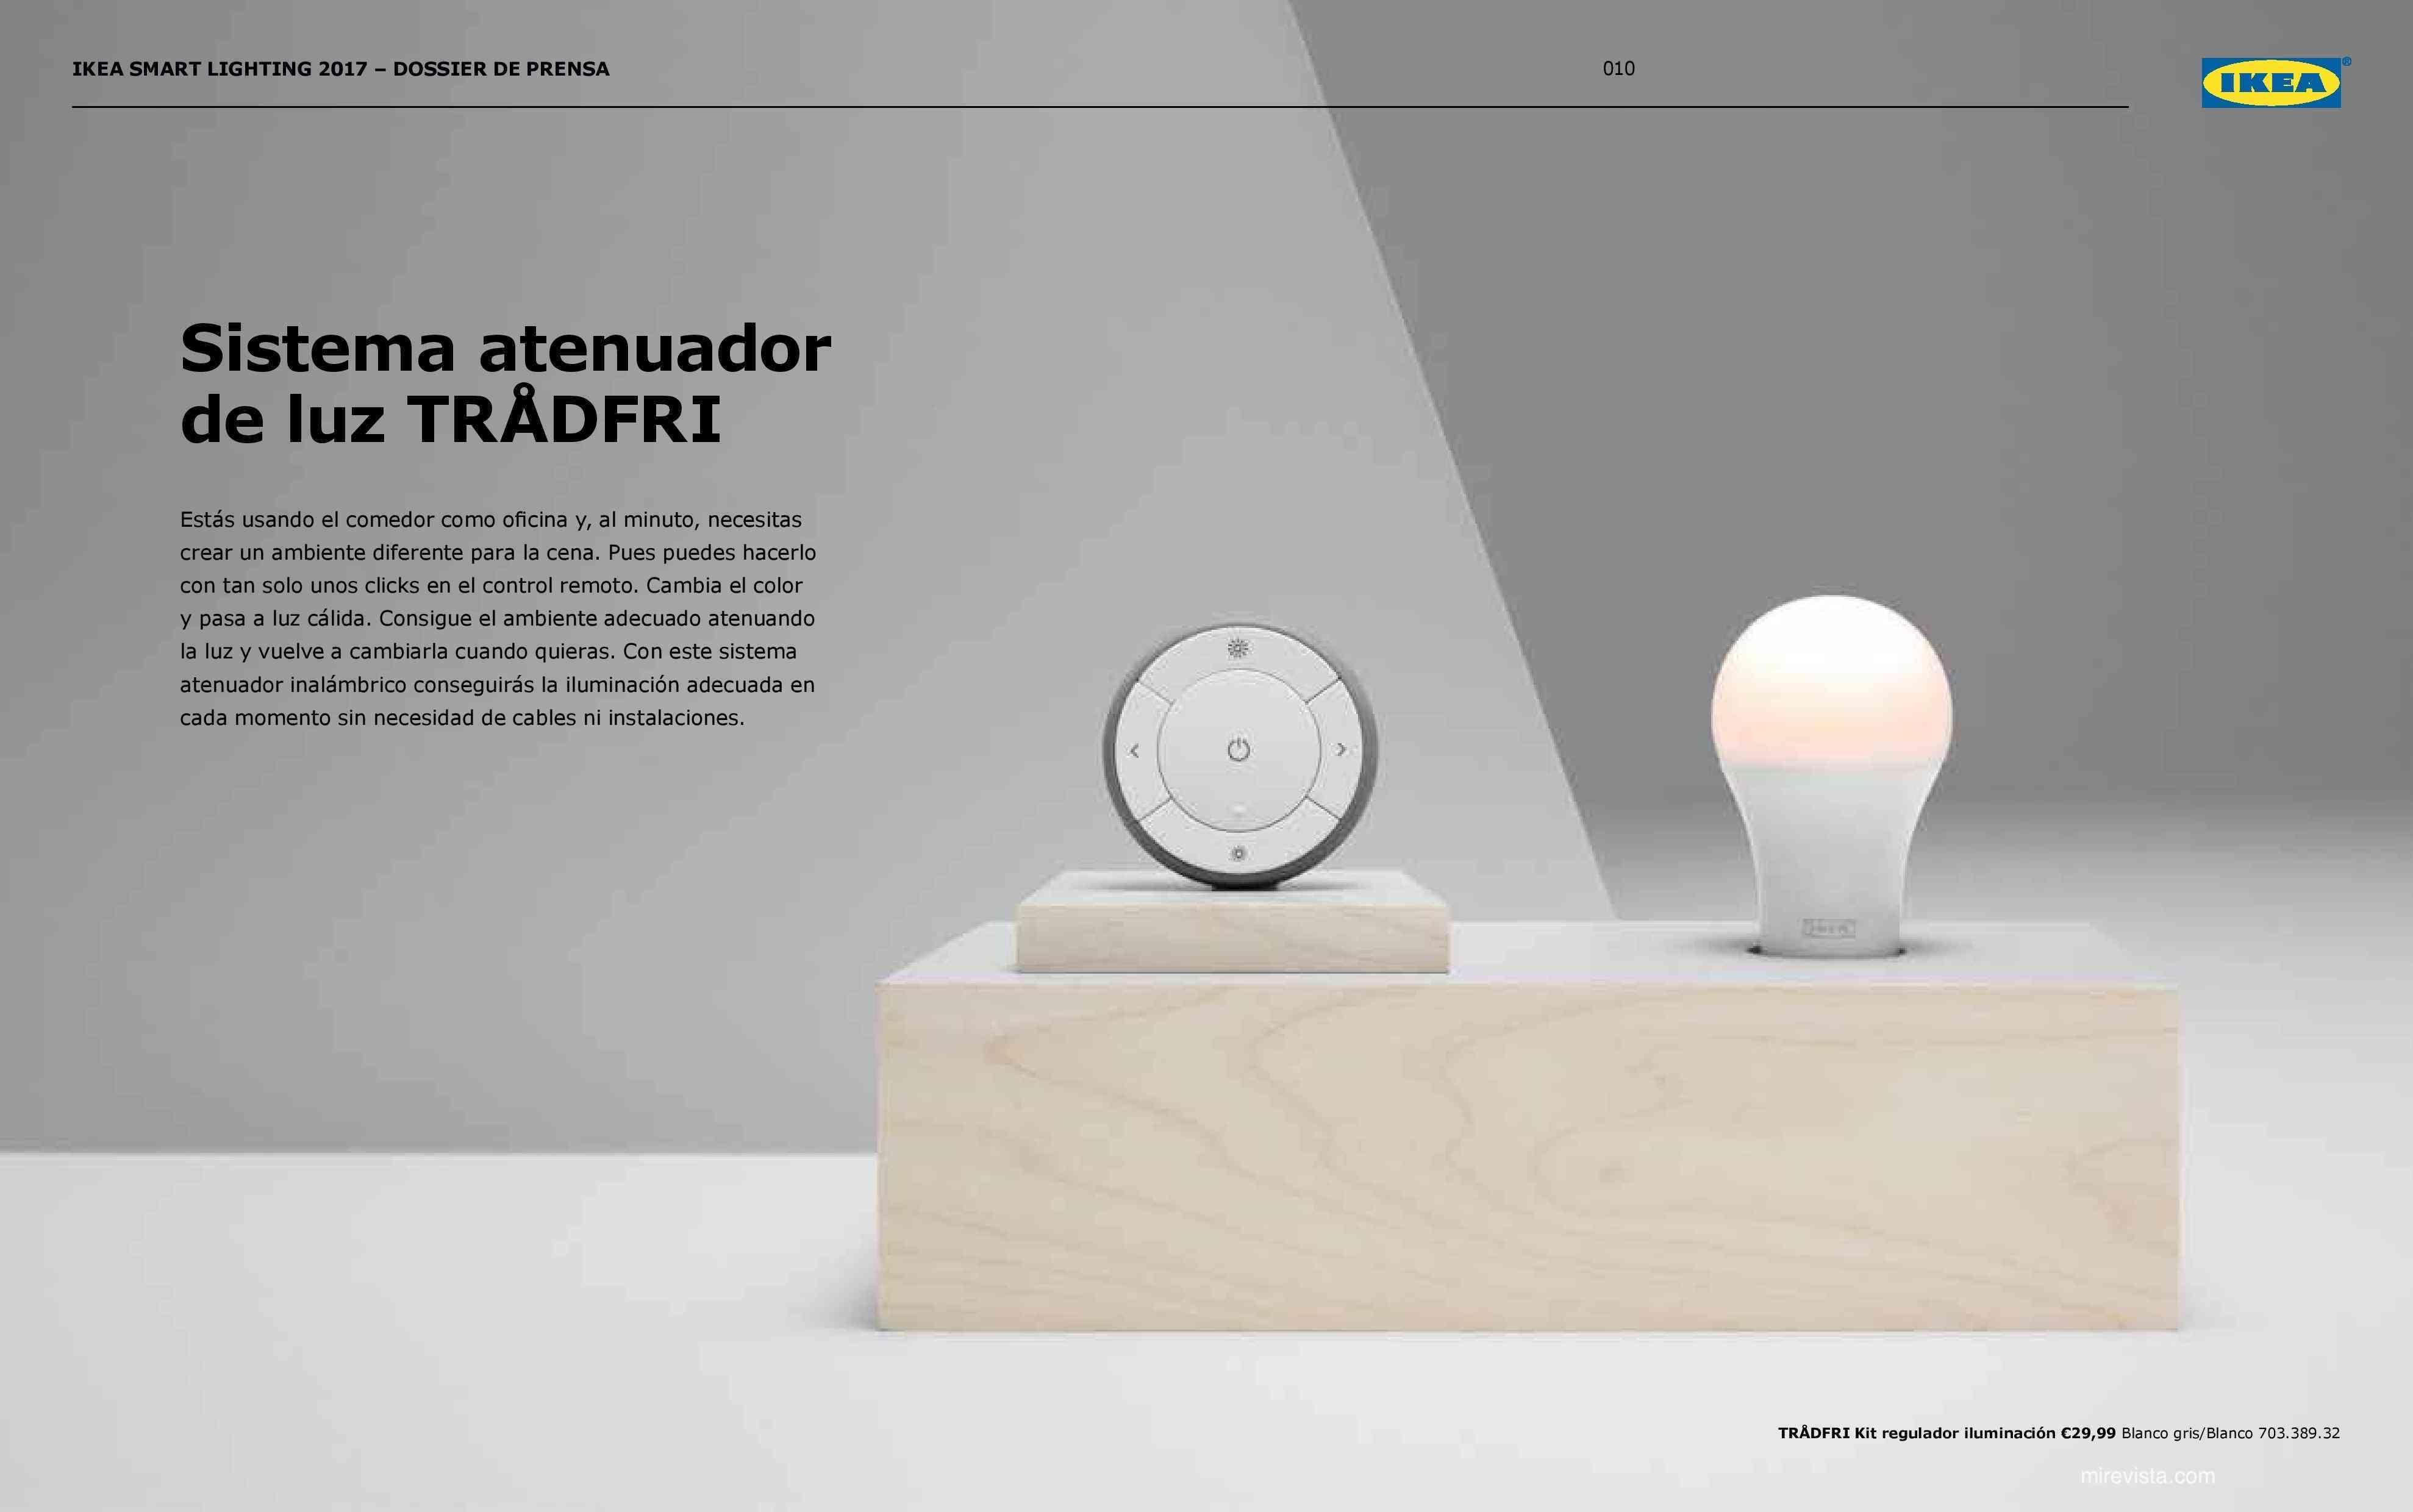 Novedades en iluminación de casas inteligentes con IKEA 66